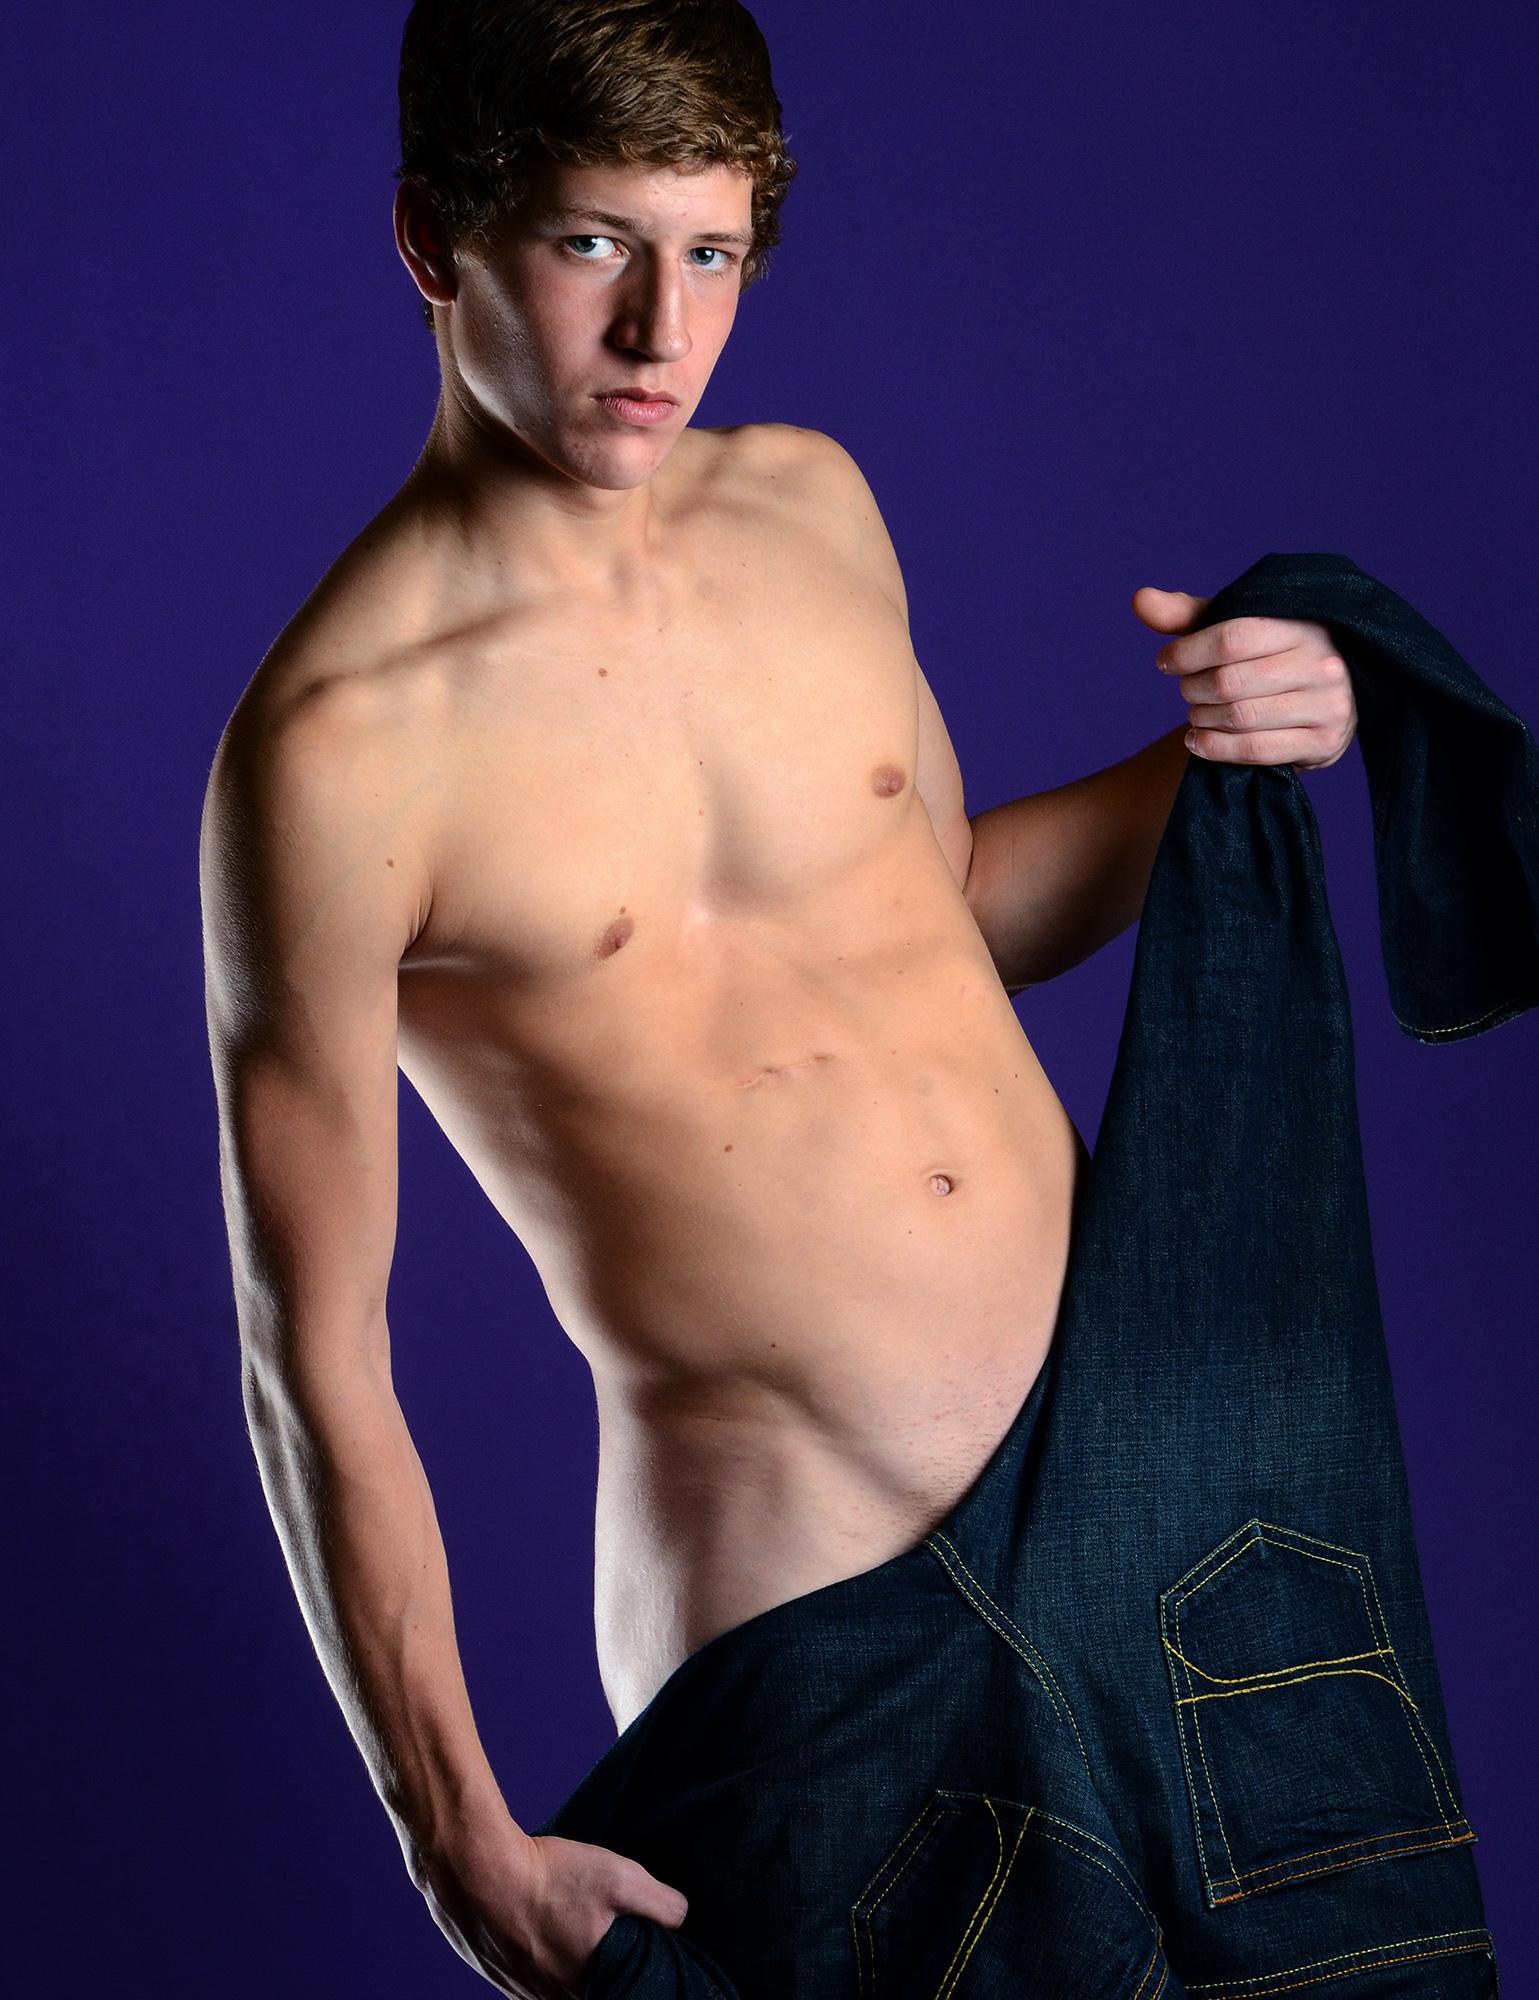 ModelTeenz Patrick